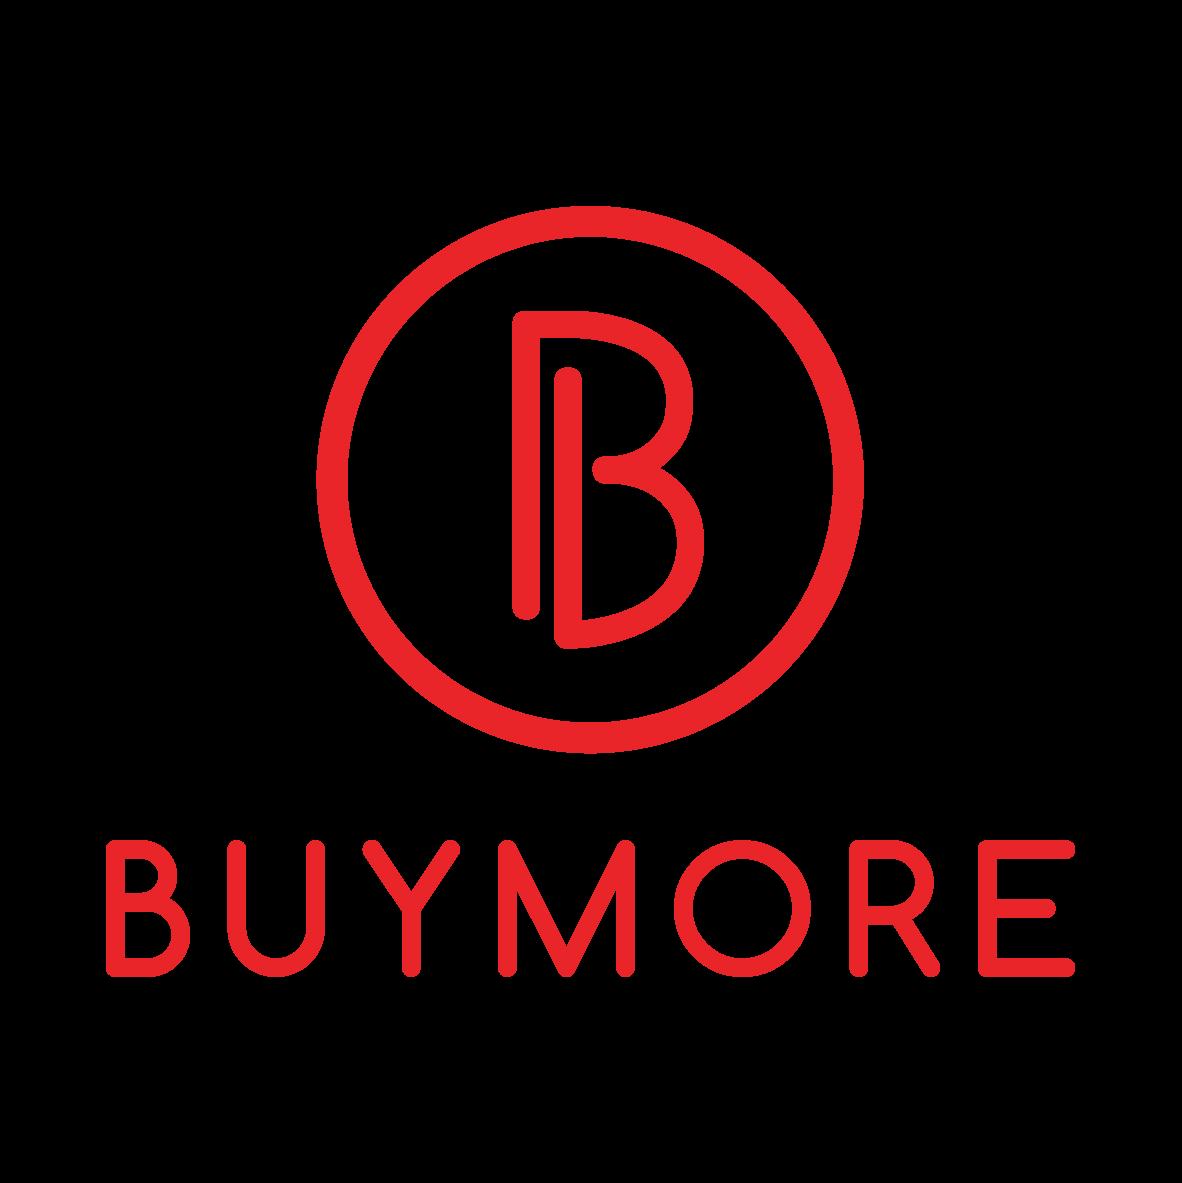 Buymore